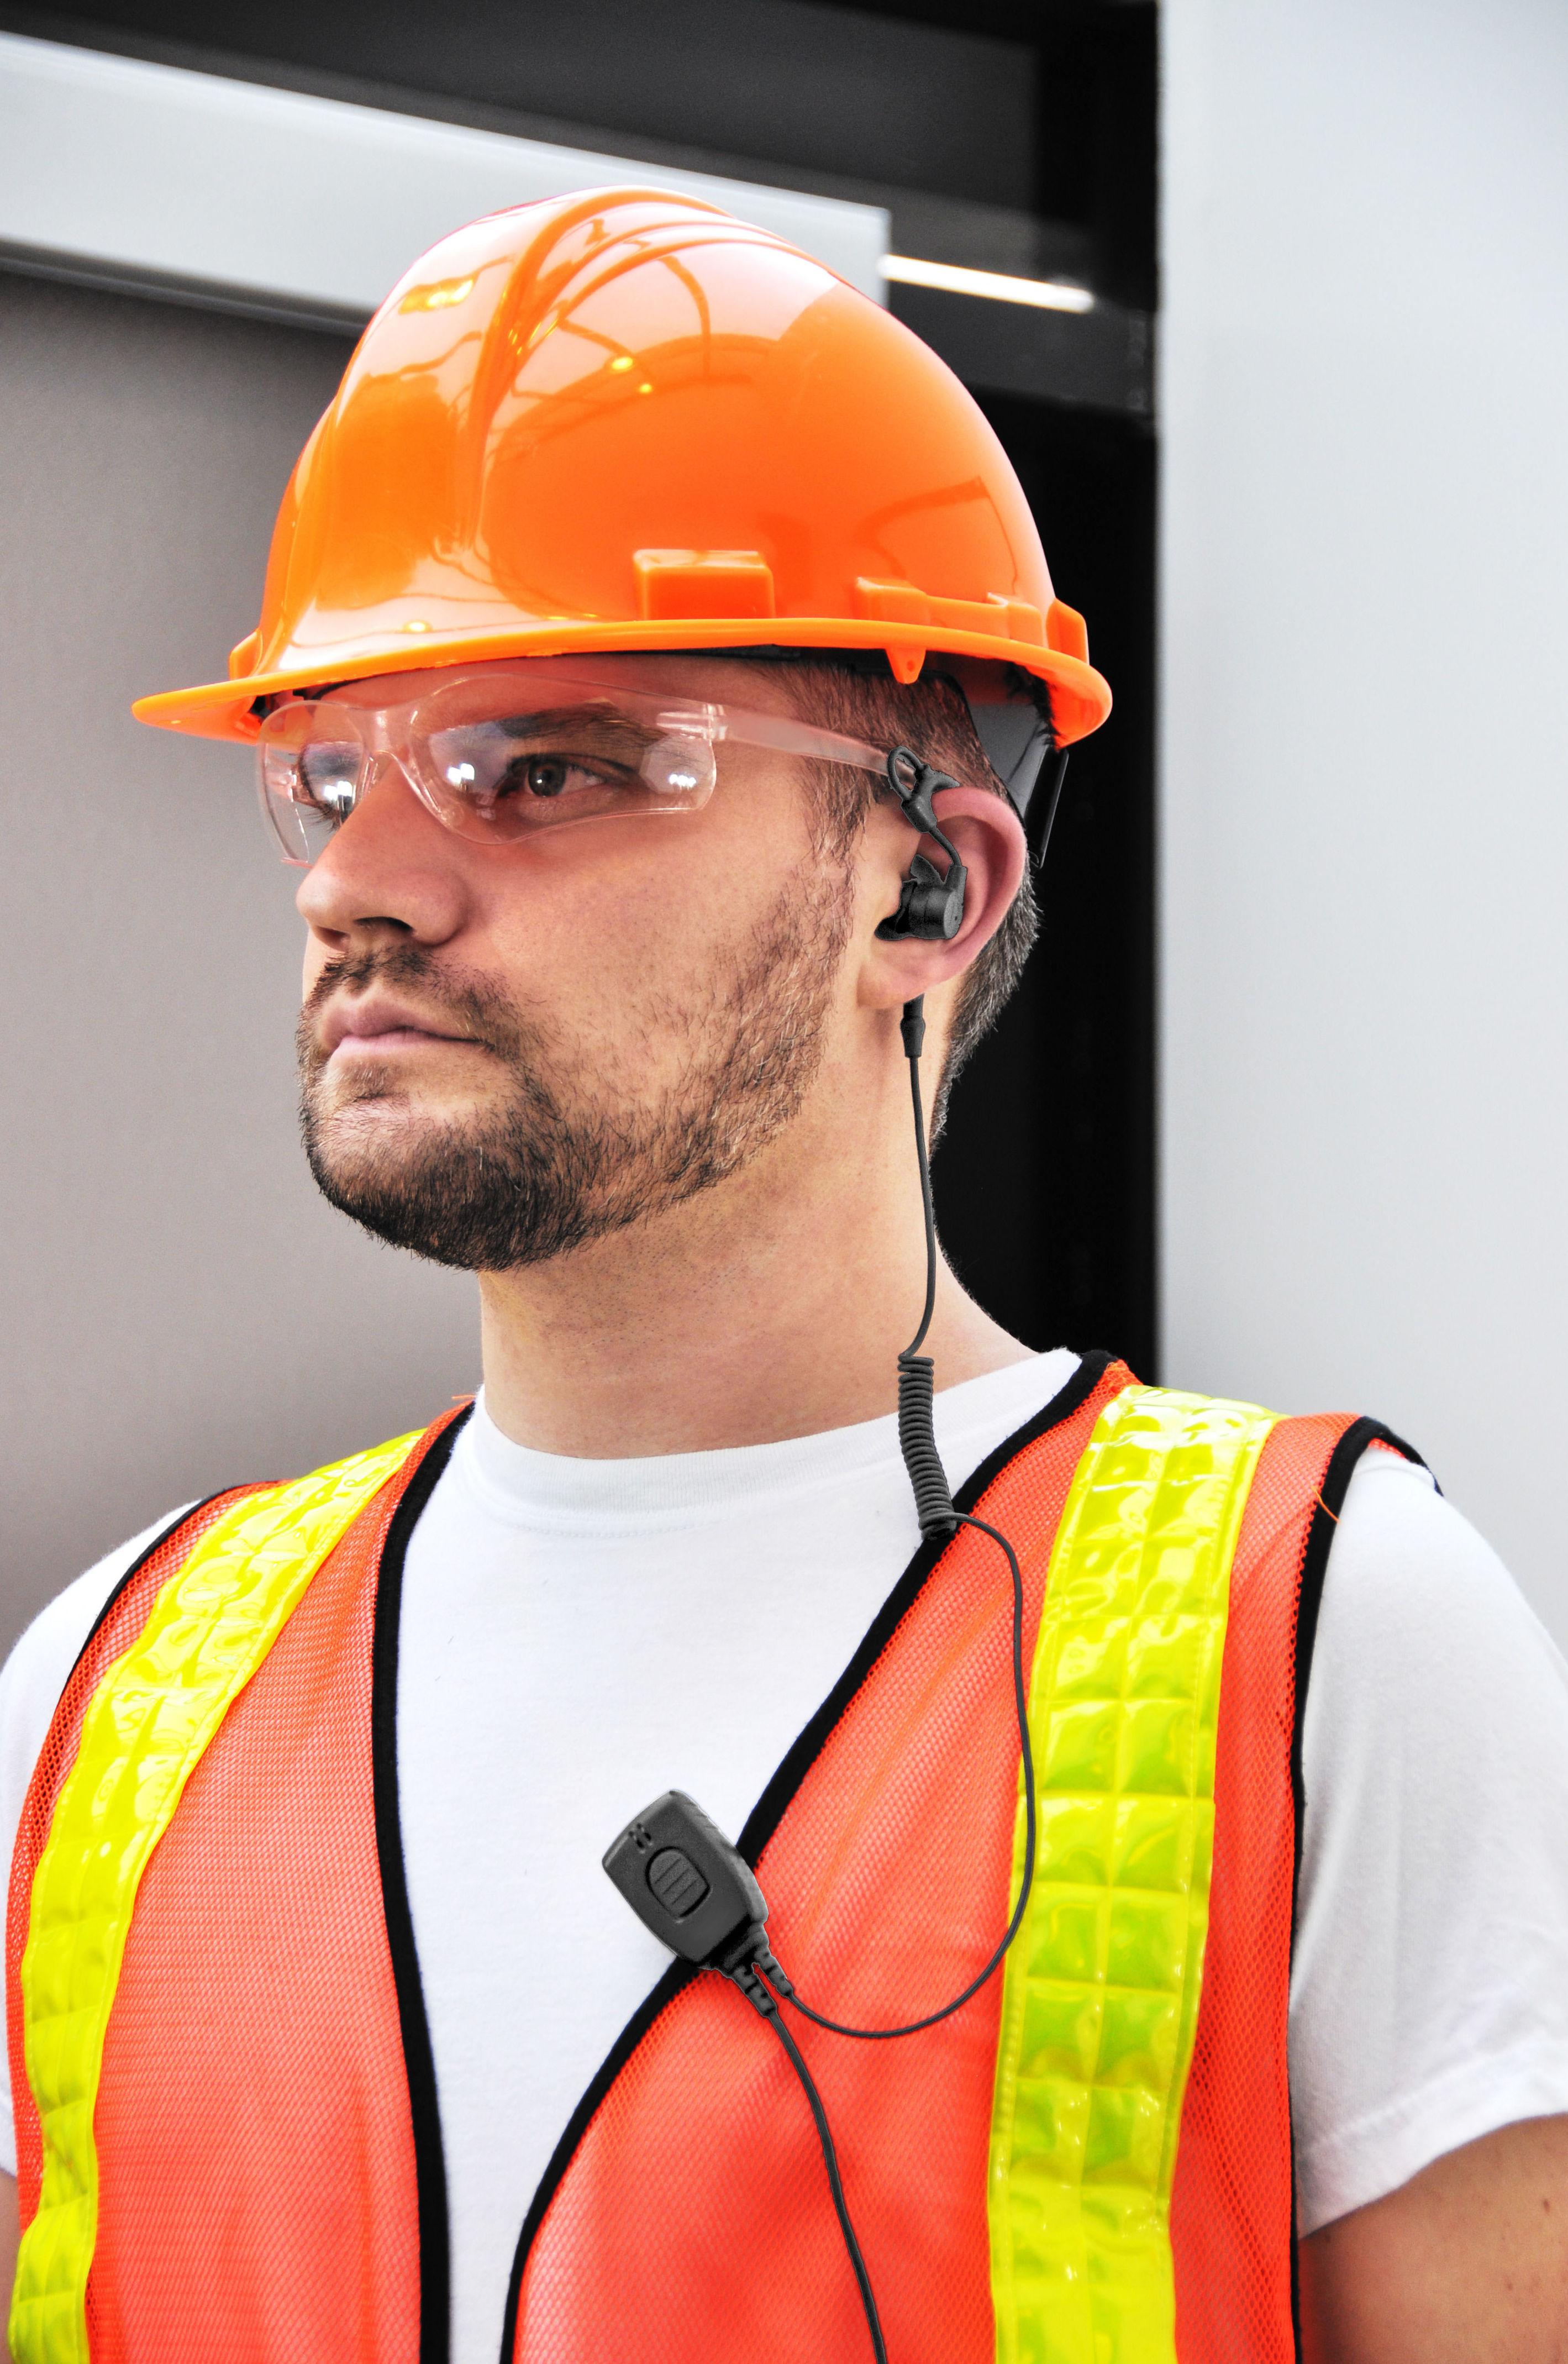 SAVOX SH-01 Wired Headset